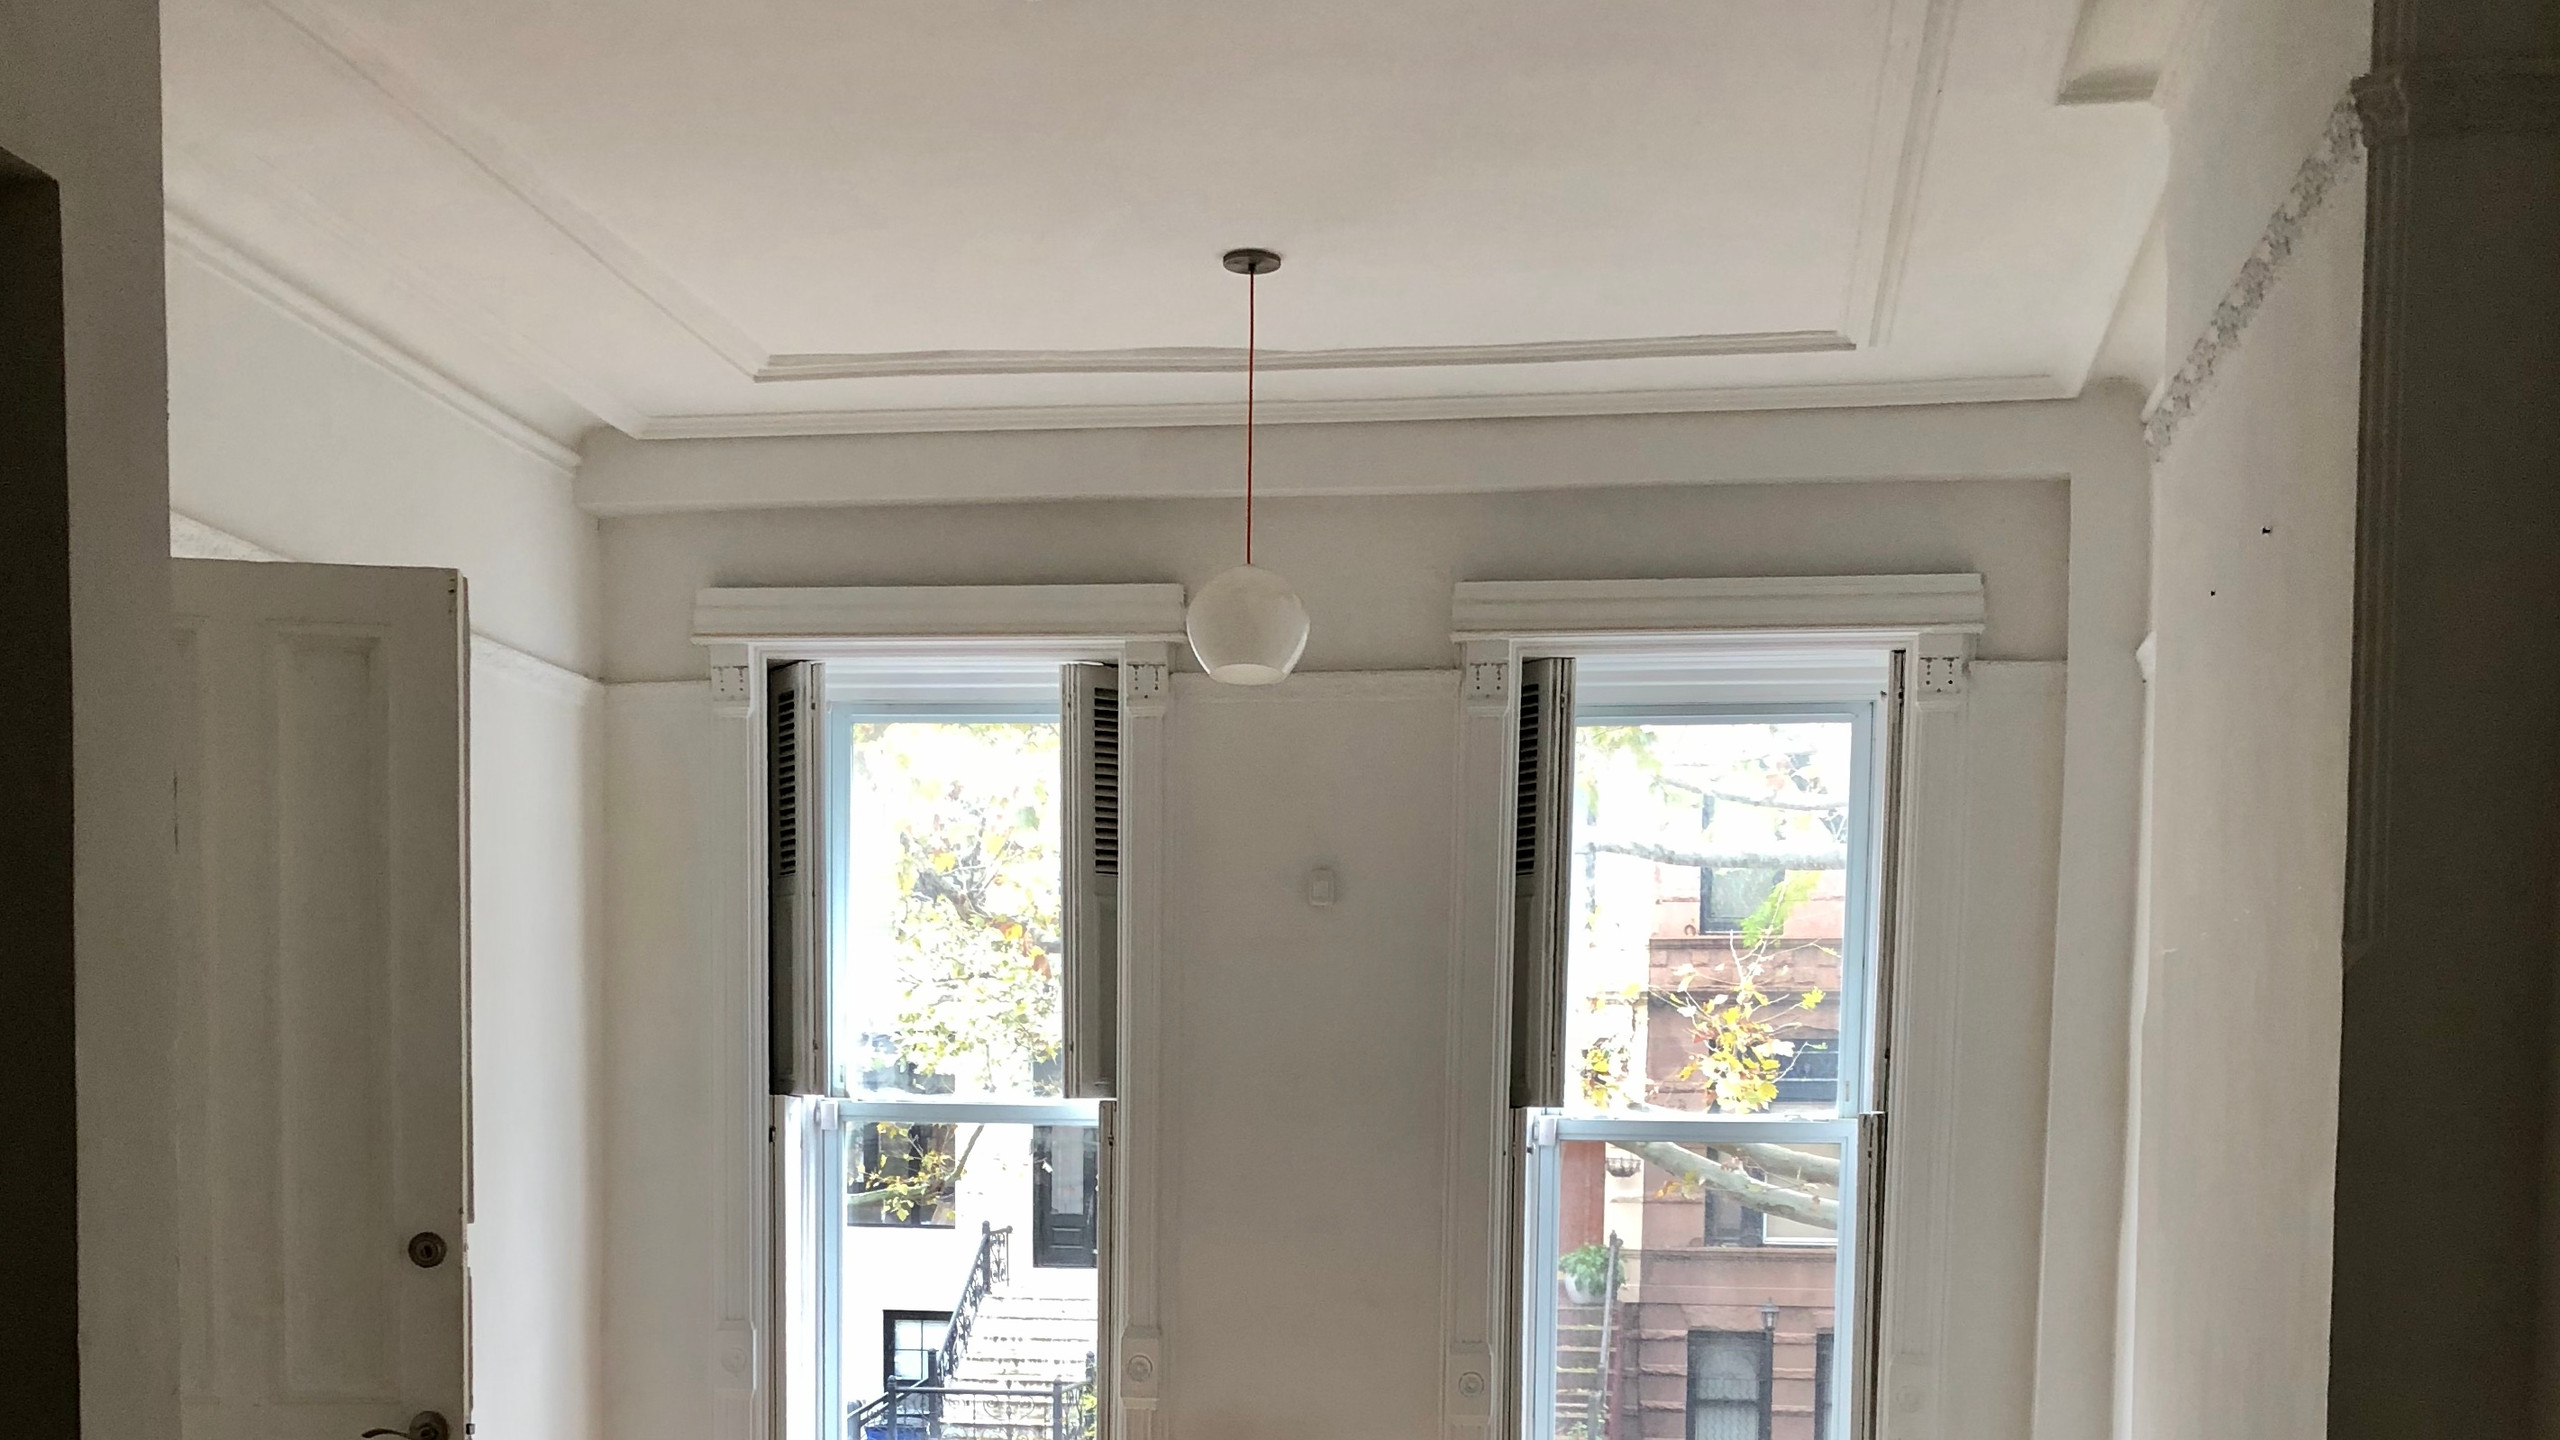 Parlor level plaster ceiling